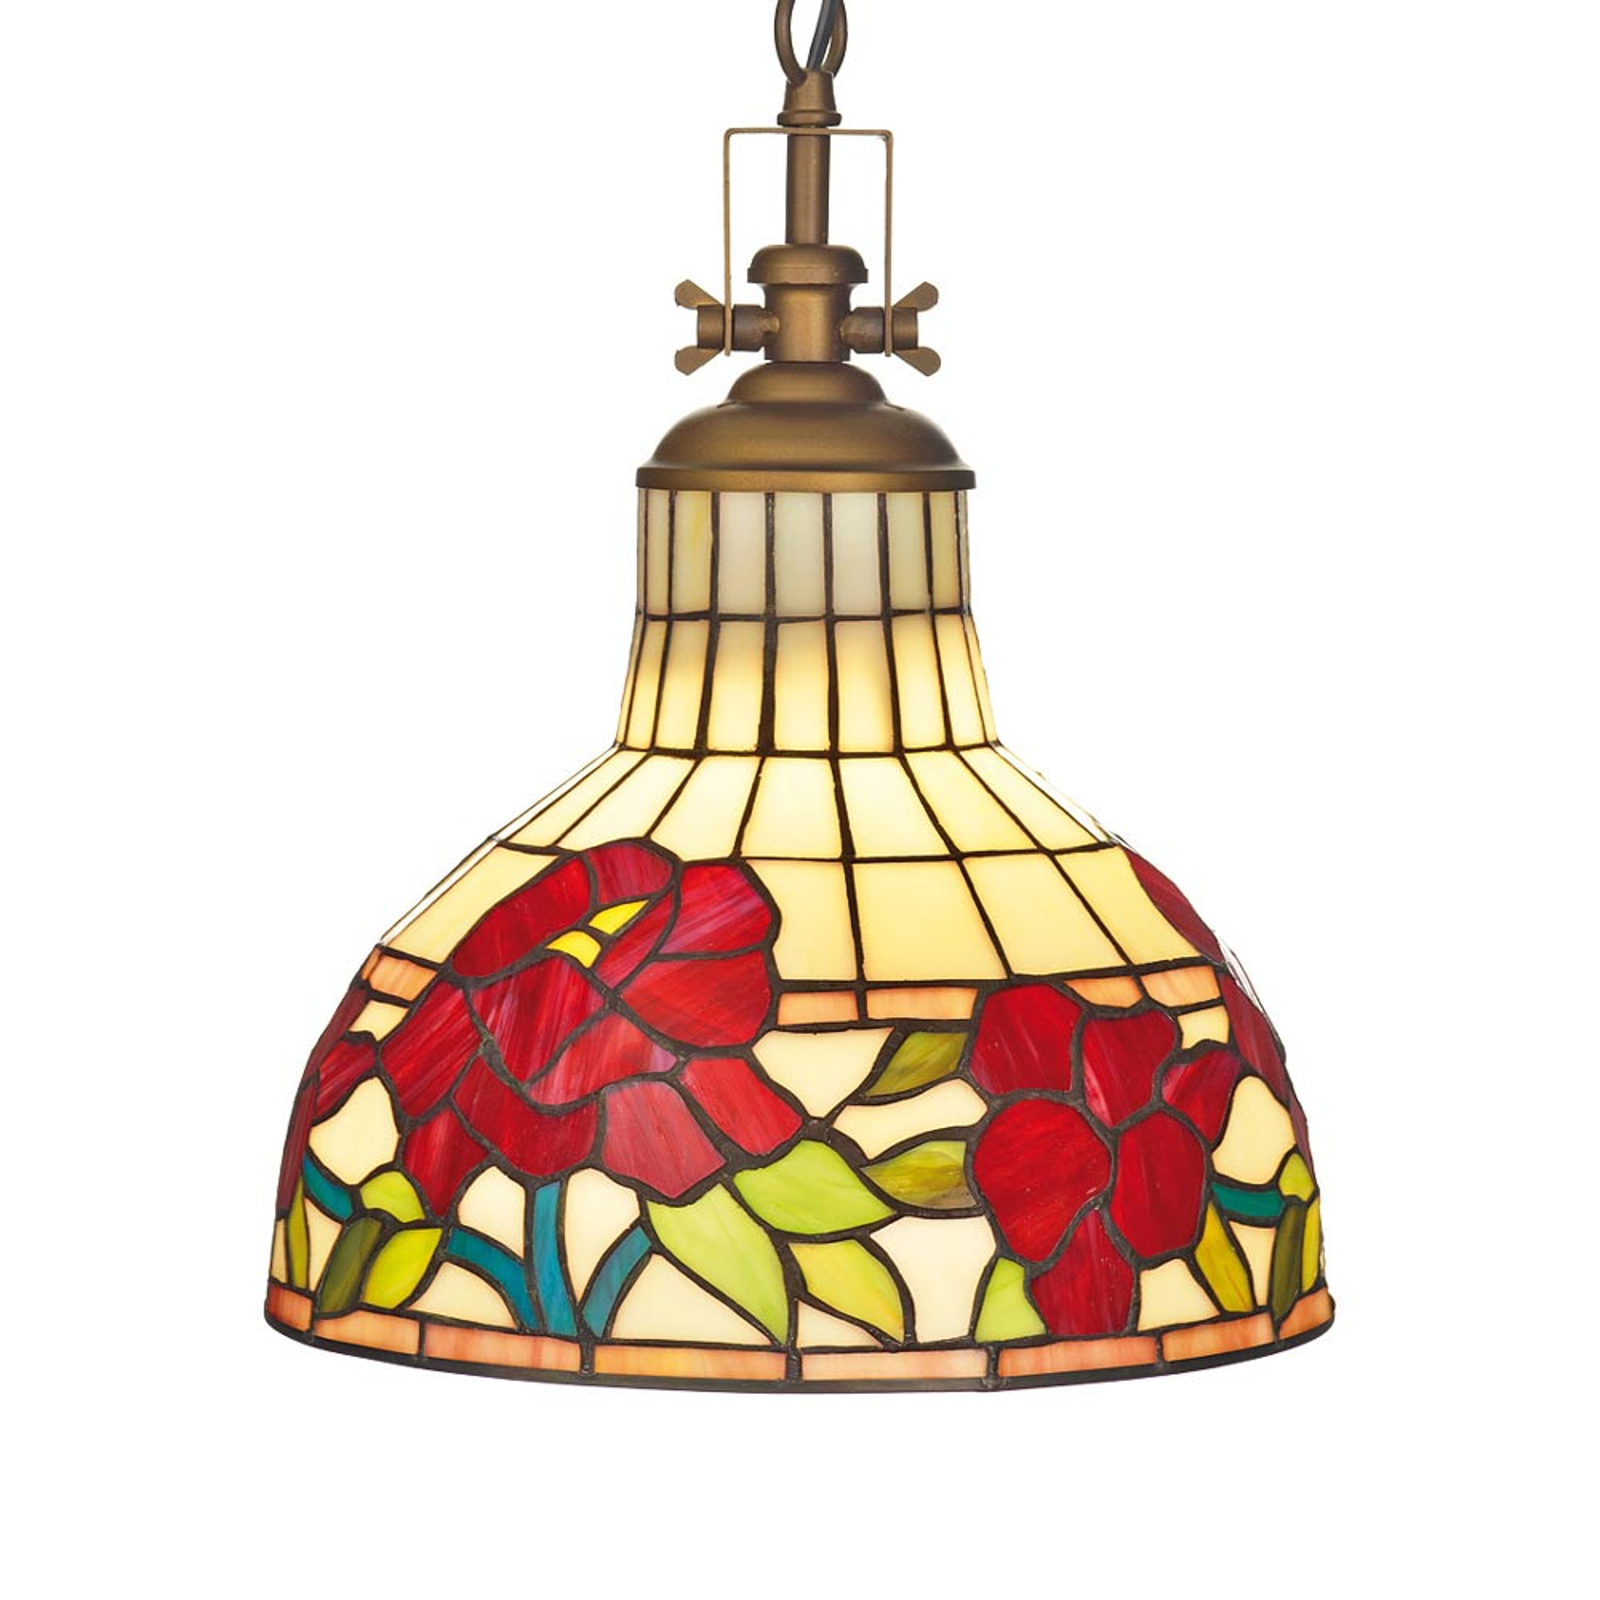 Mooie hanglamp Yria in Tiffany-stijl